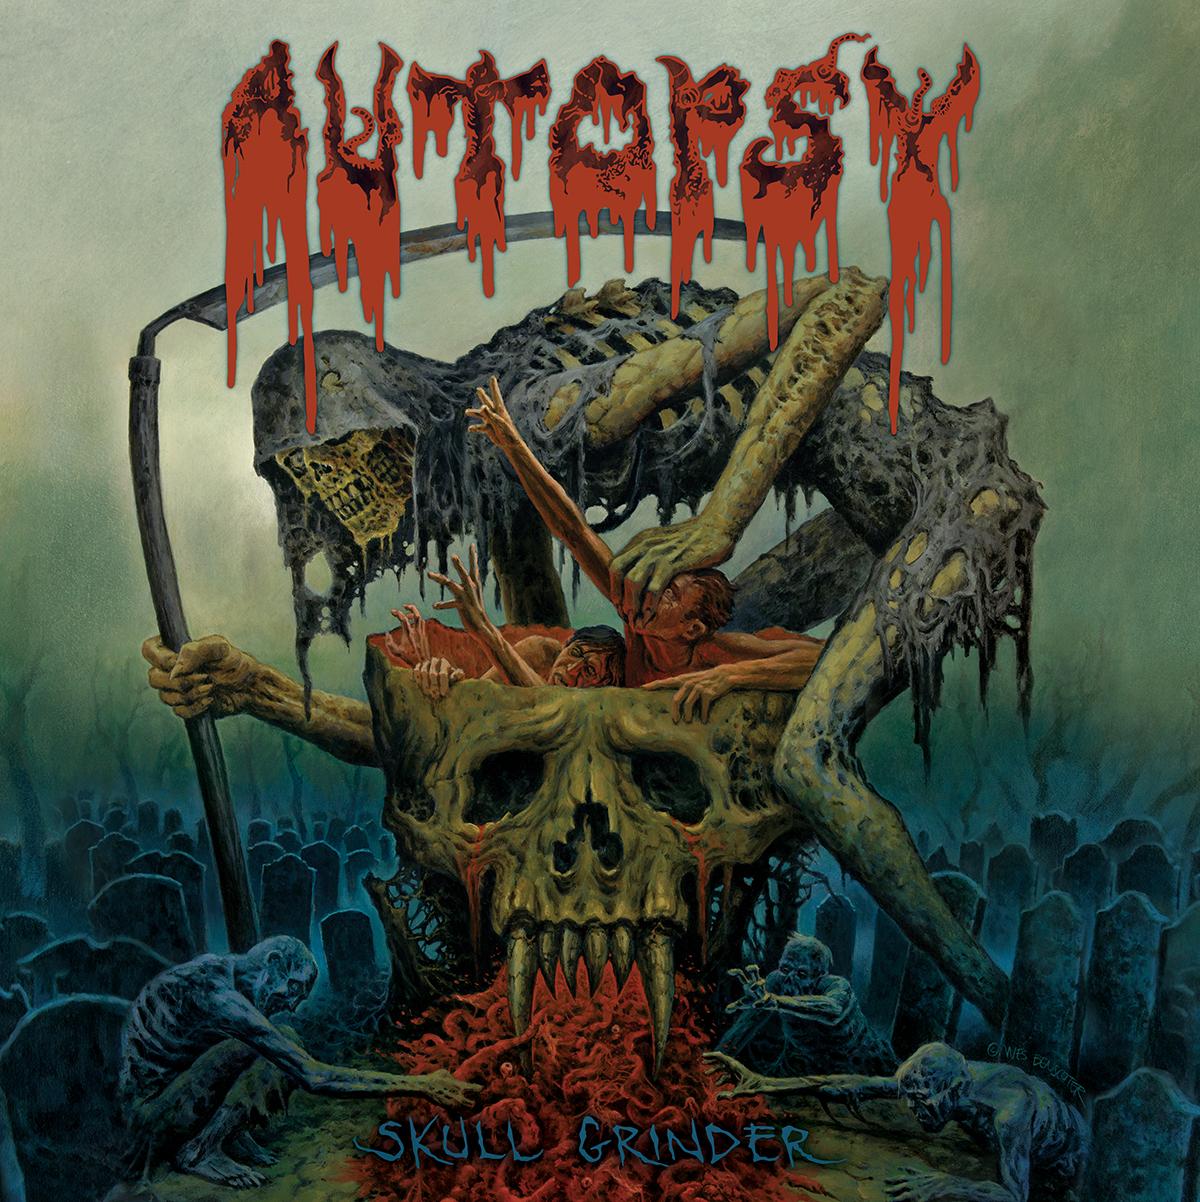 Autopsy – Skull Grinder Review